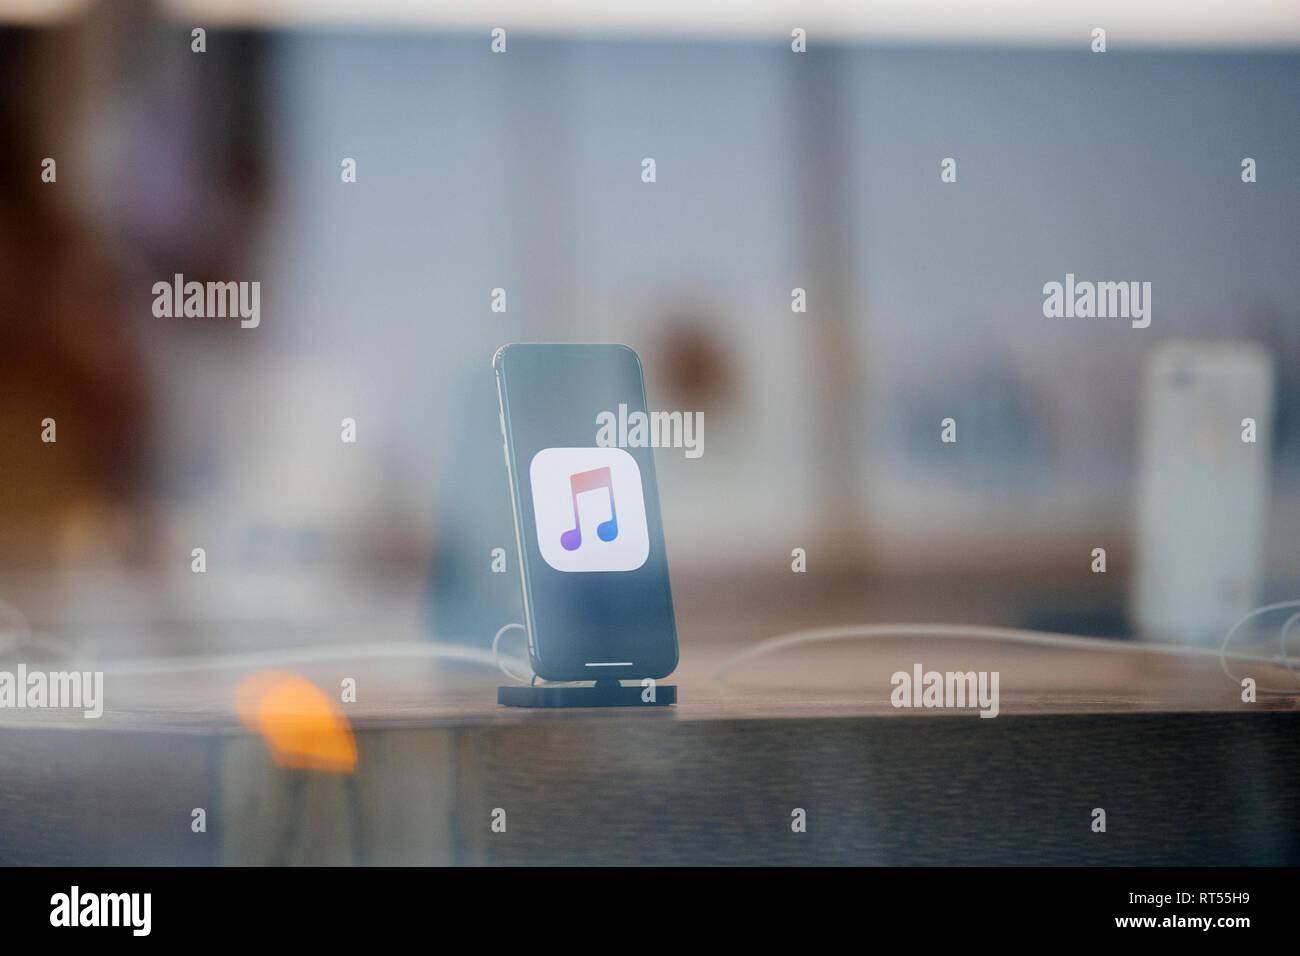 STRASBOURG, FRANCE - NOV 3, 2017: Latest Apple iPhone X goes